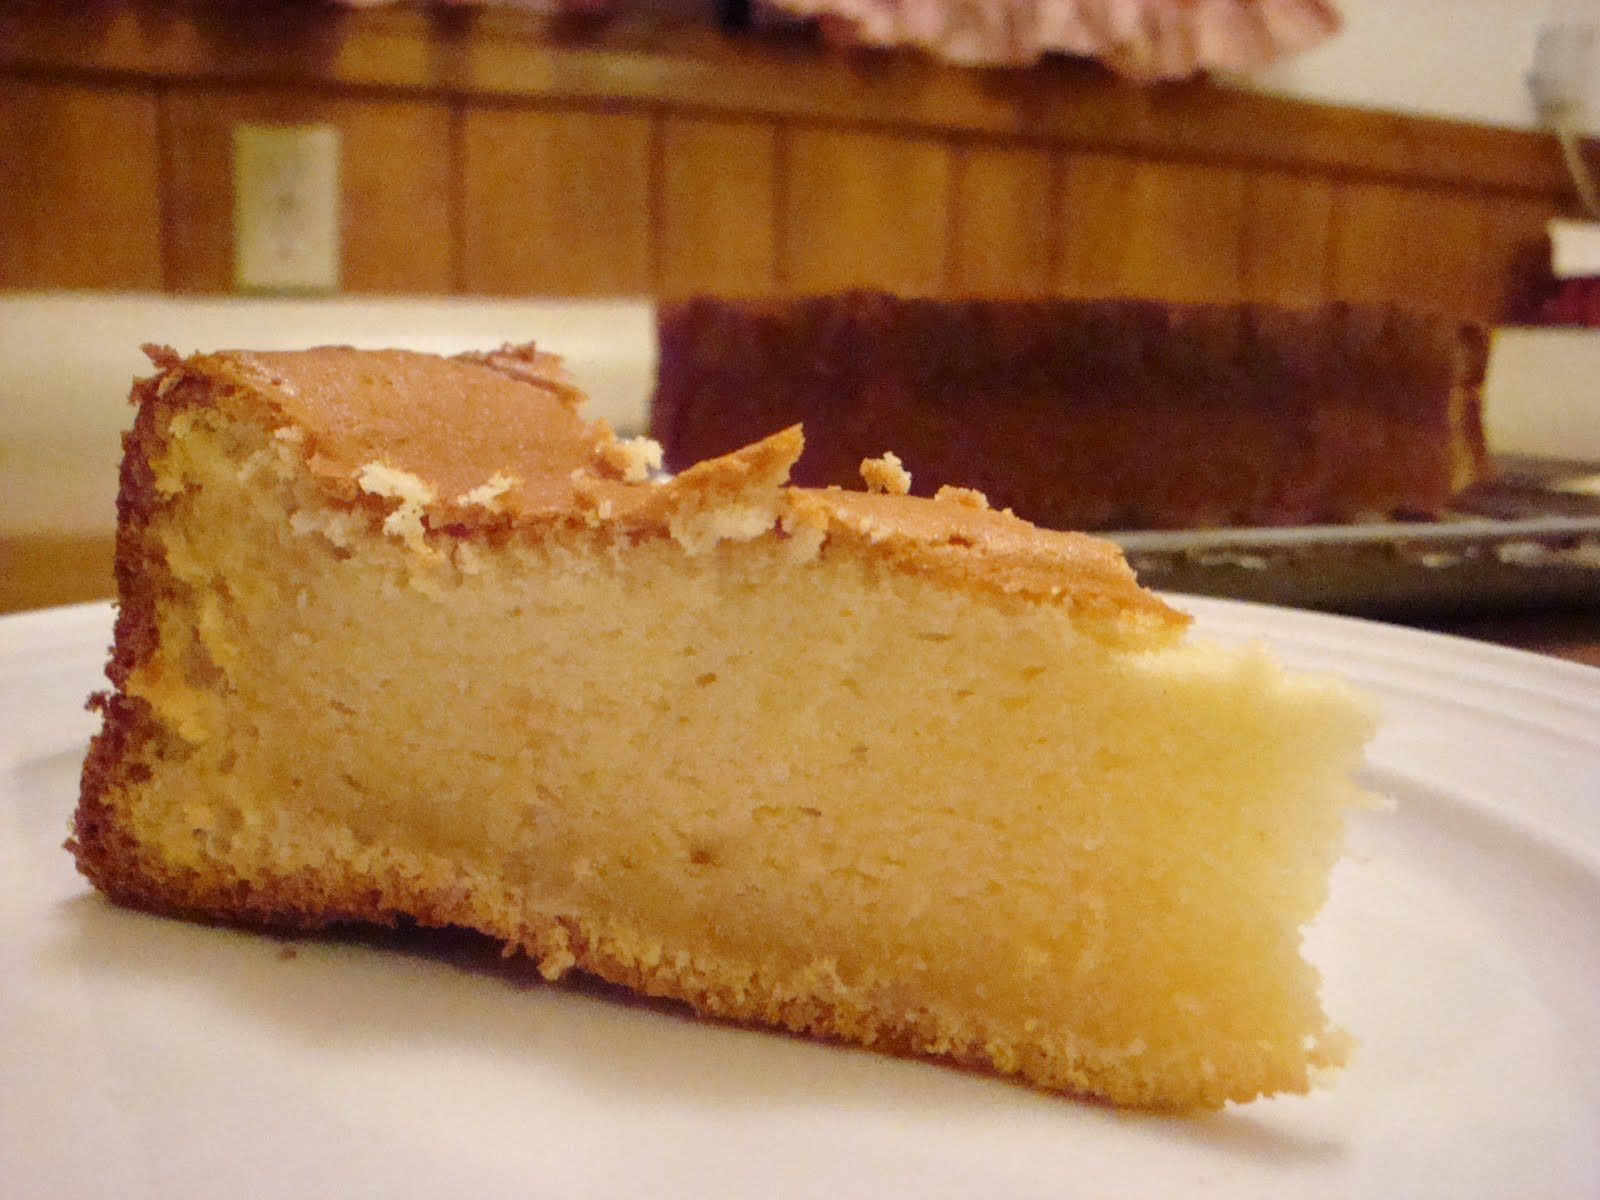 Recipes For Japanese Sponge Cake: DAILY DOSES OF SUGAR: Castella (Japanese Sponge Cake